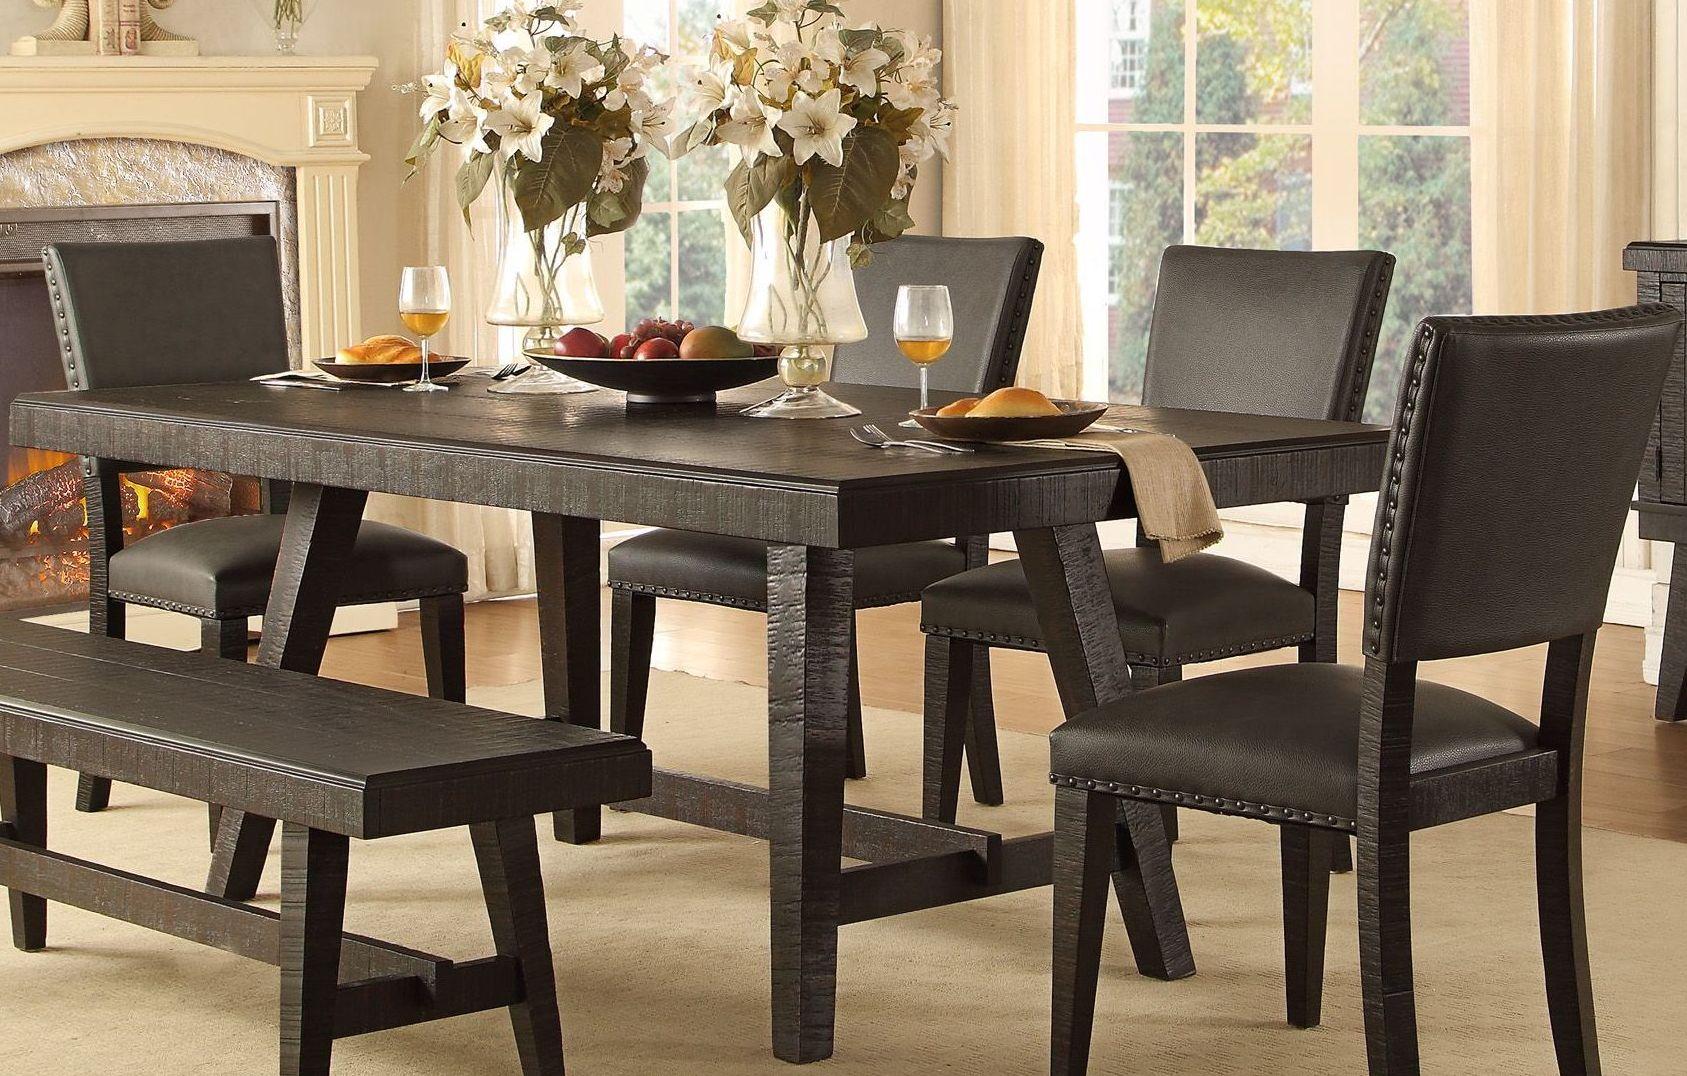 Fenwick dark grey dining table